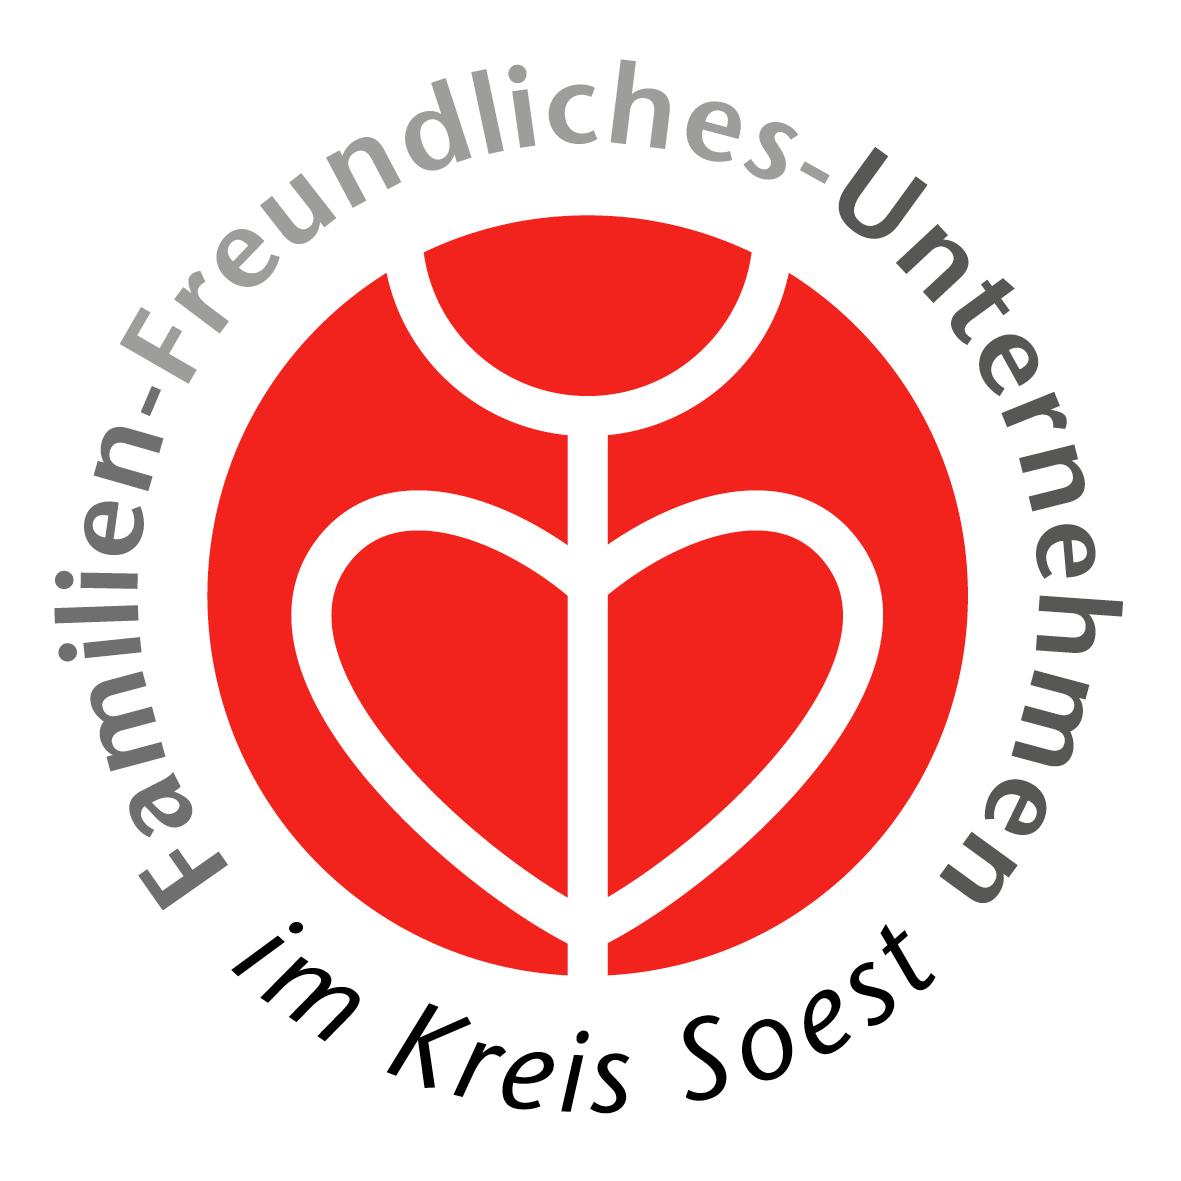 Family-friendly company seal in Soest seal for MEISTERWERKE